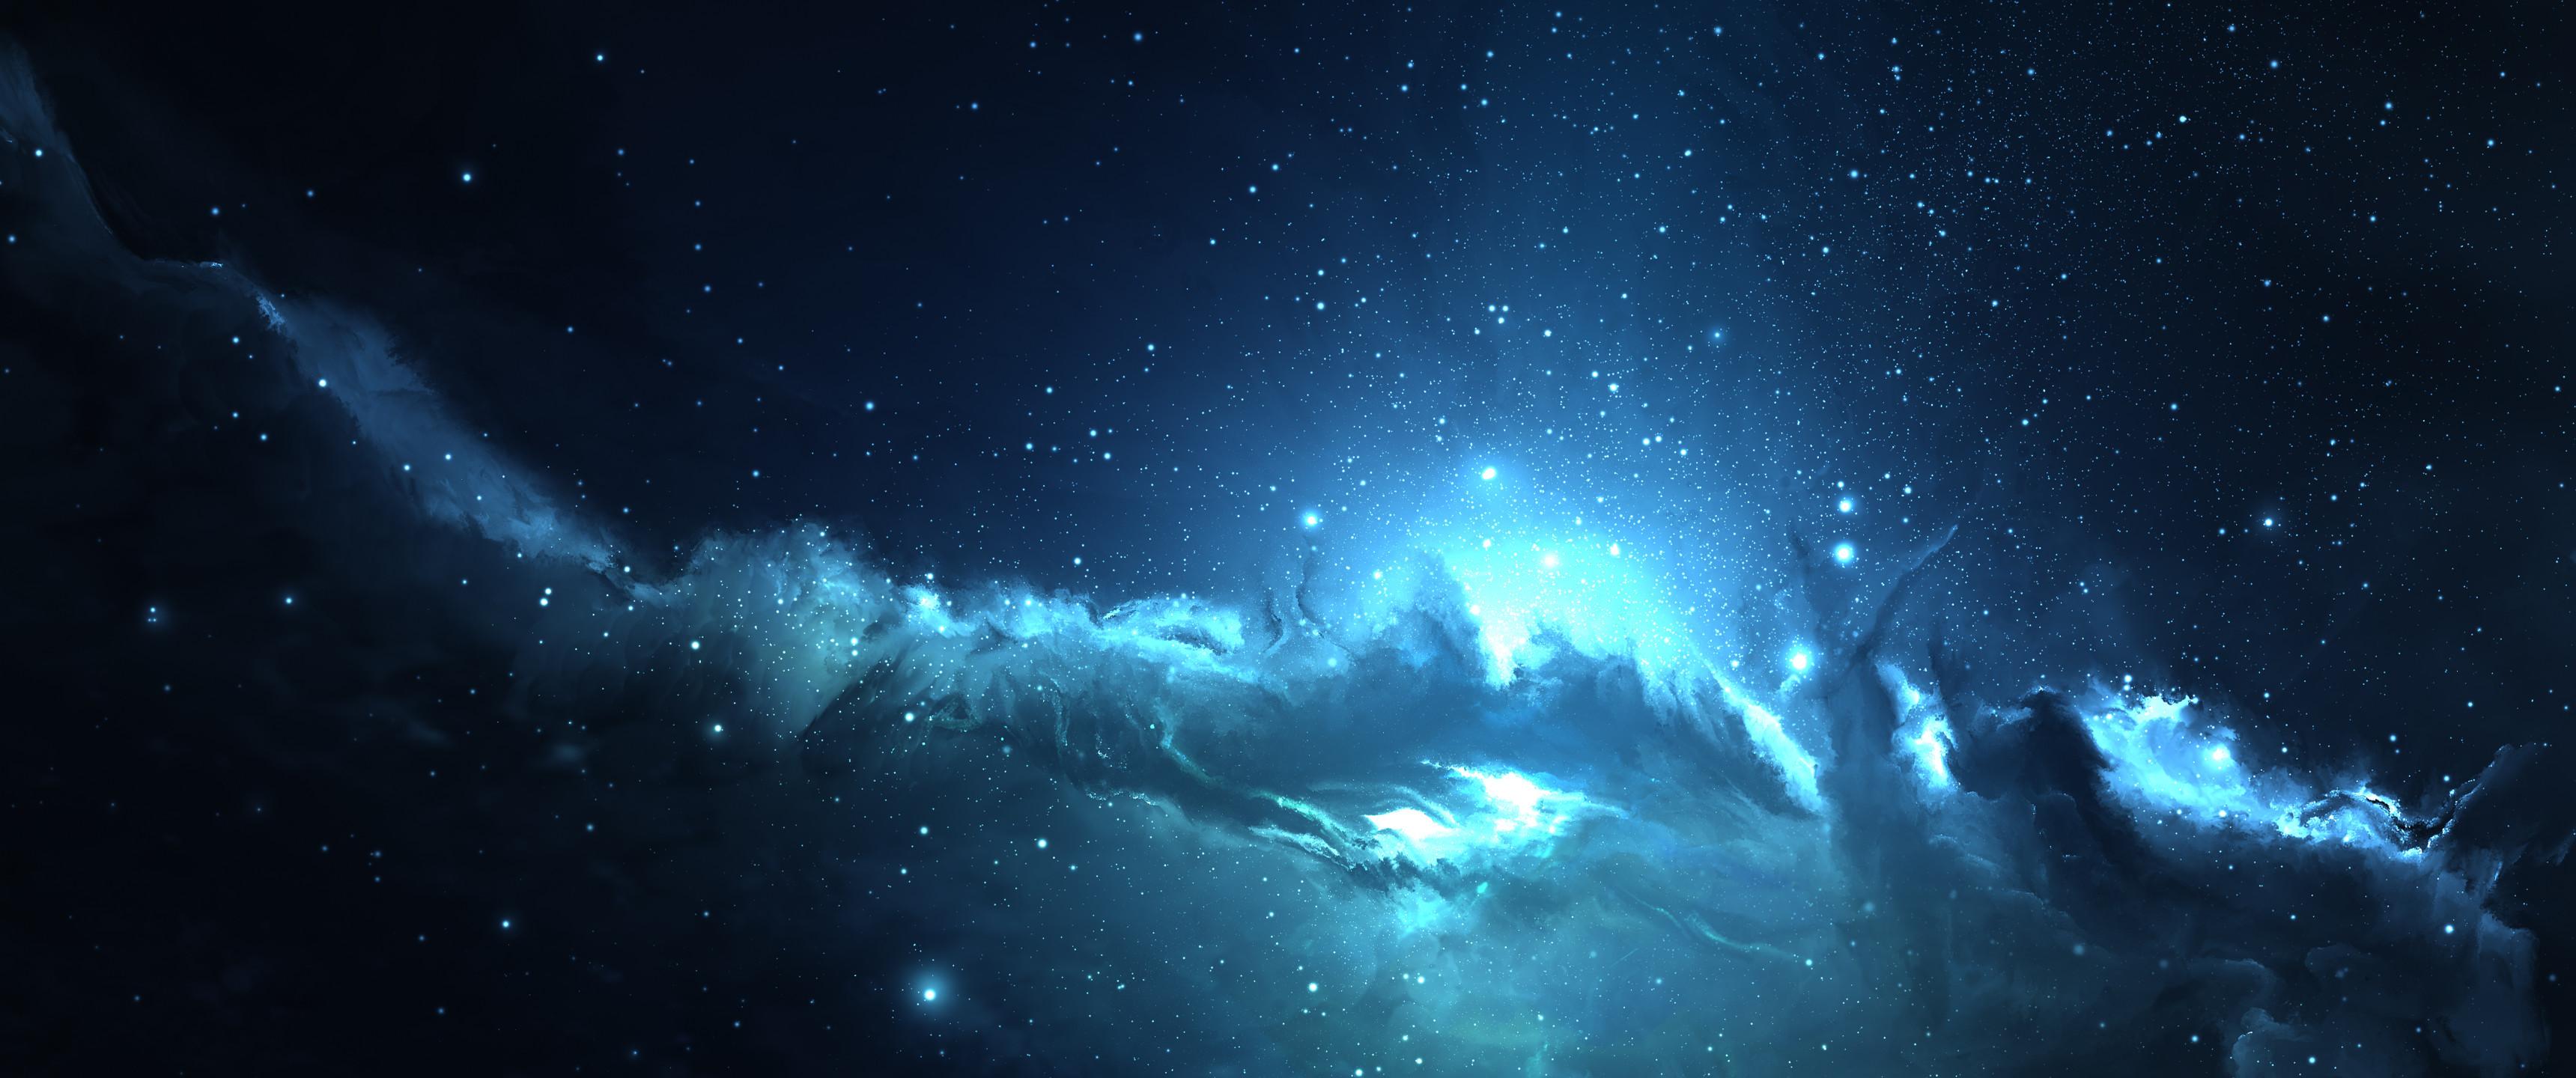 … ultrawide, Astrophotography, Space, Blue Wallpapers HD Desktop .